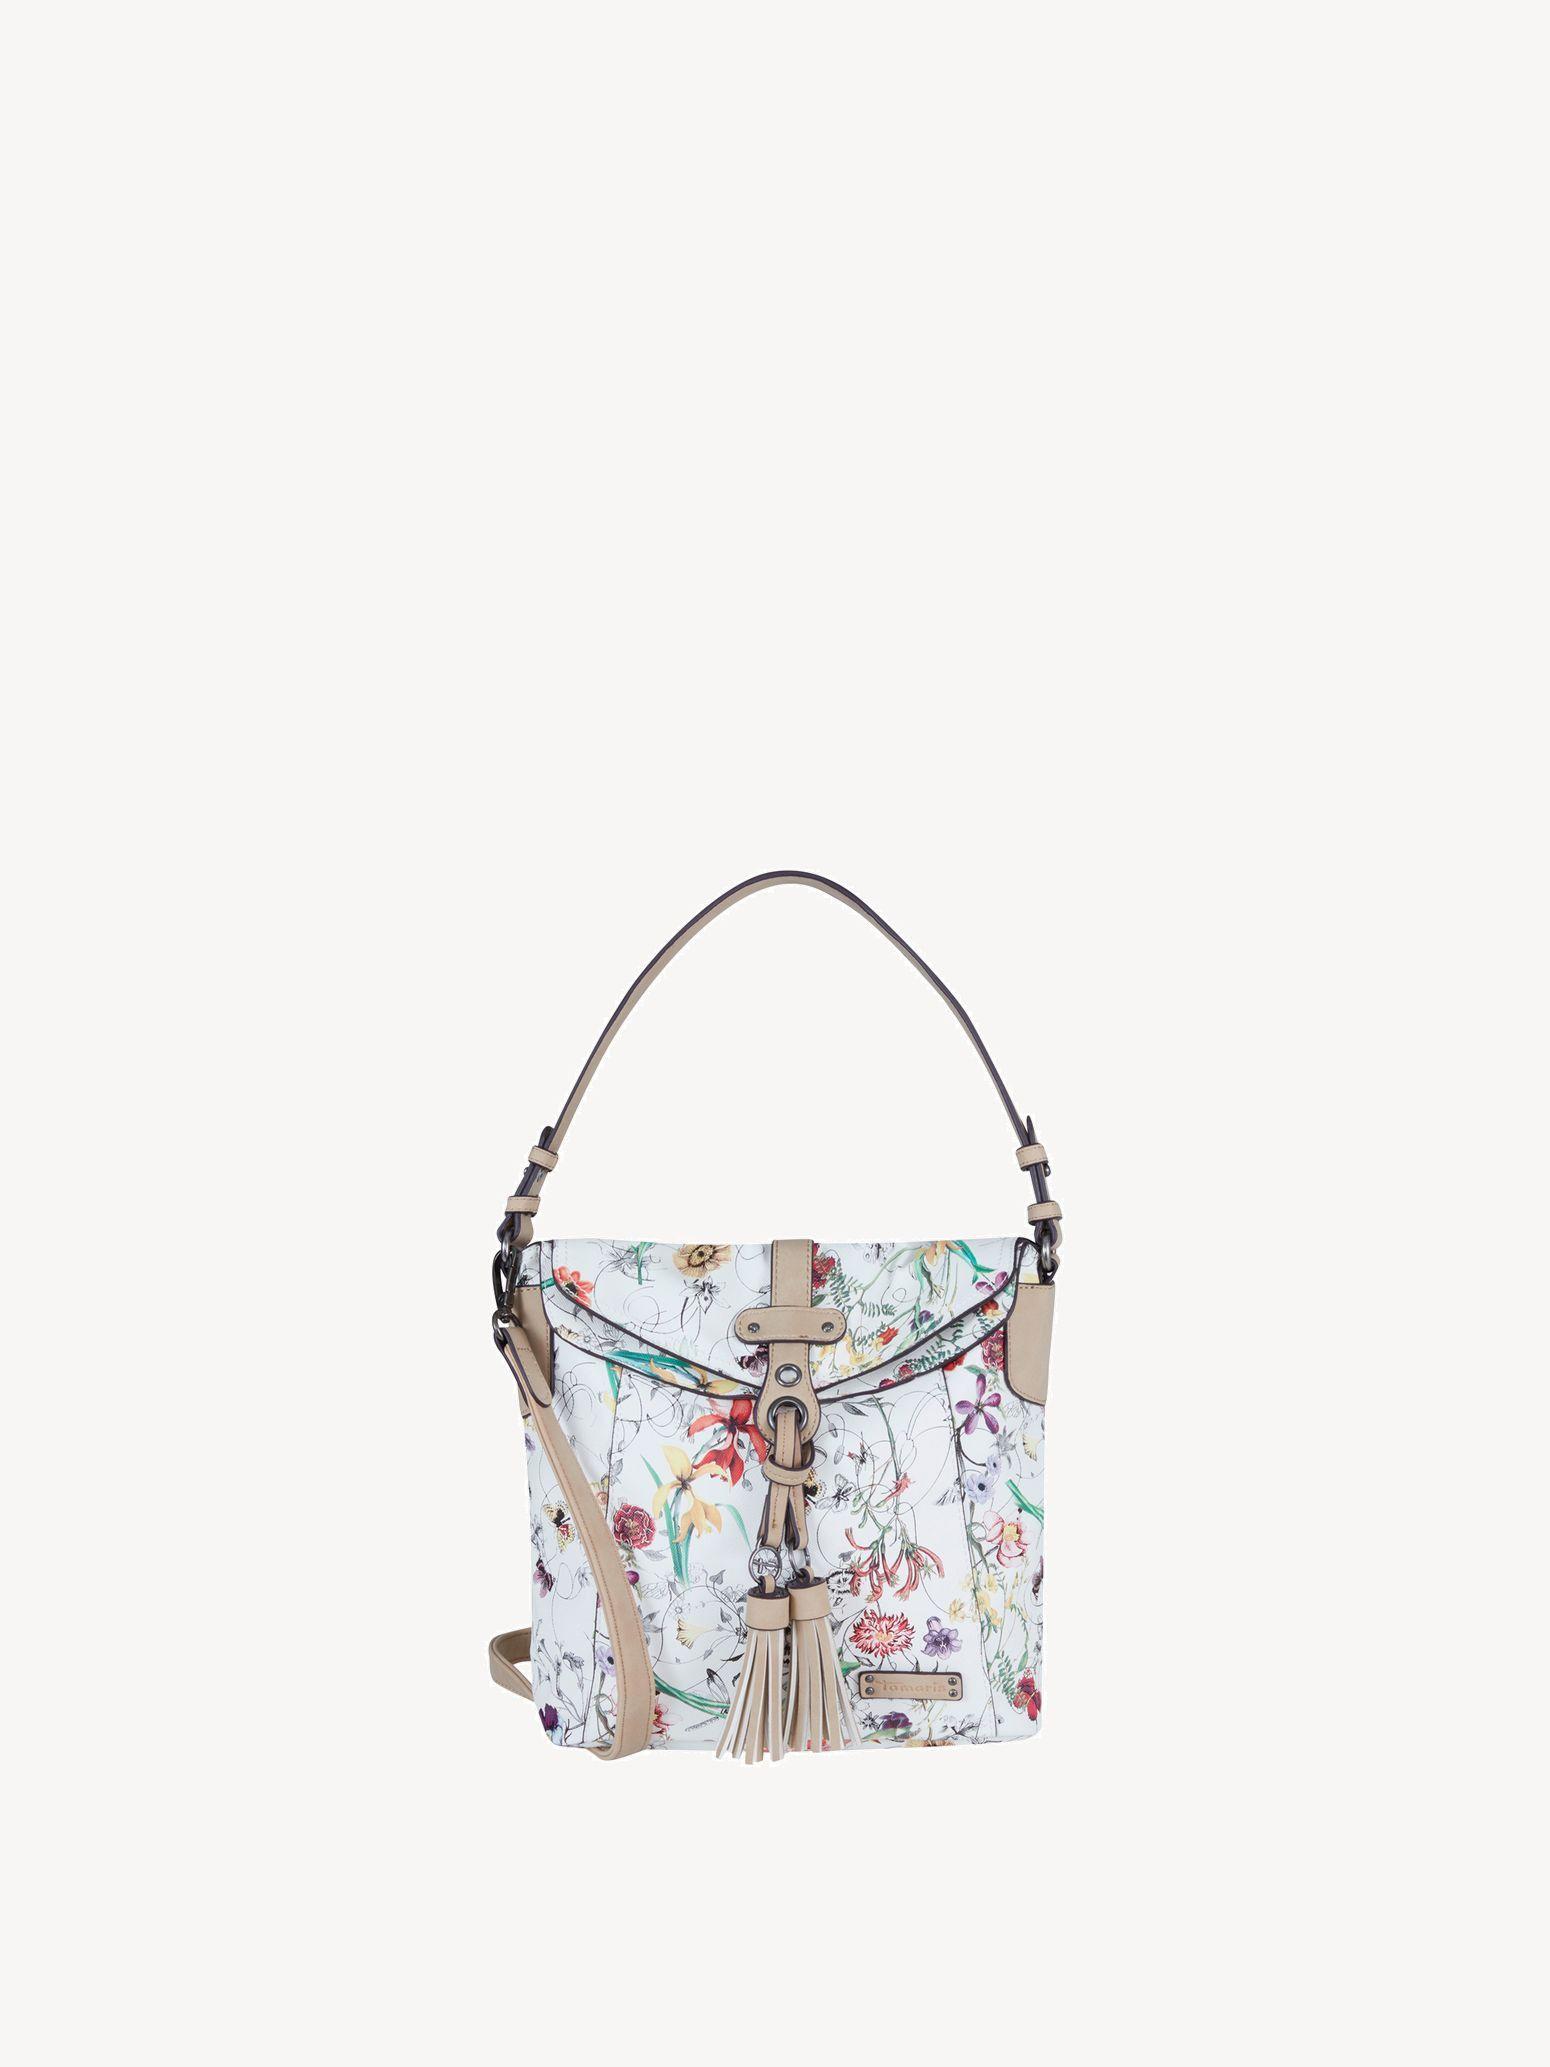 cee57ec2a0cf4 Adelia 3011191-199-1  Tamaris Handtaschen online kaufen!